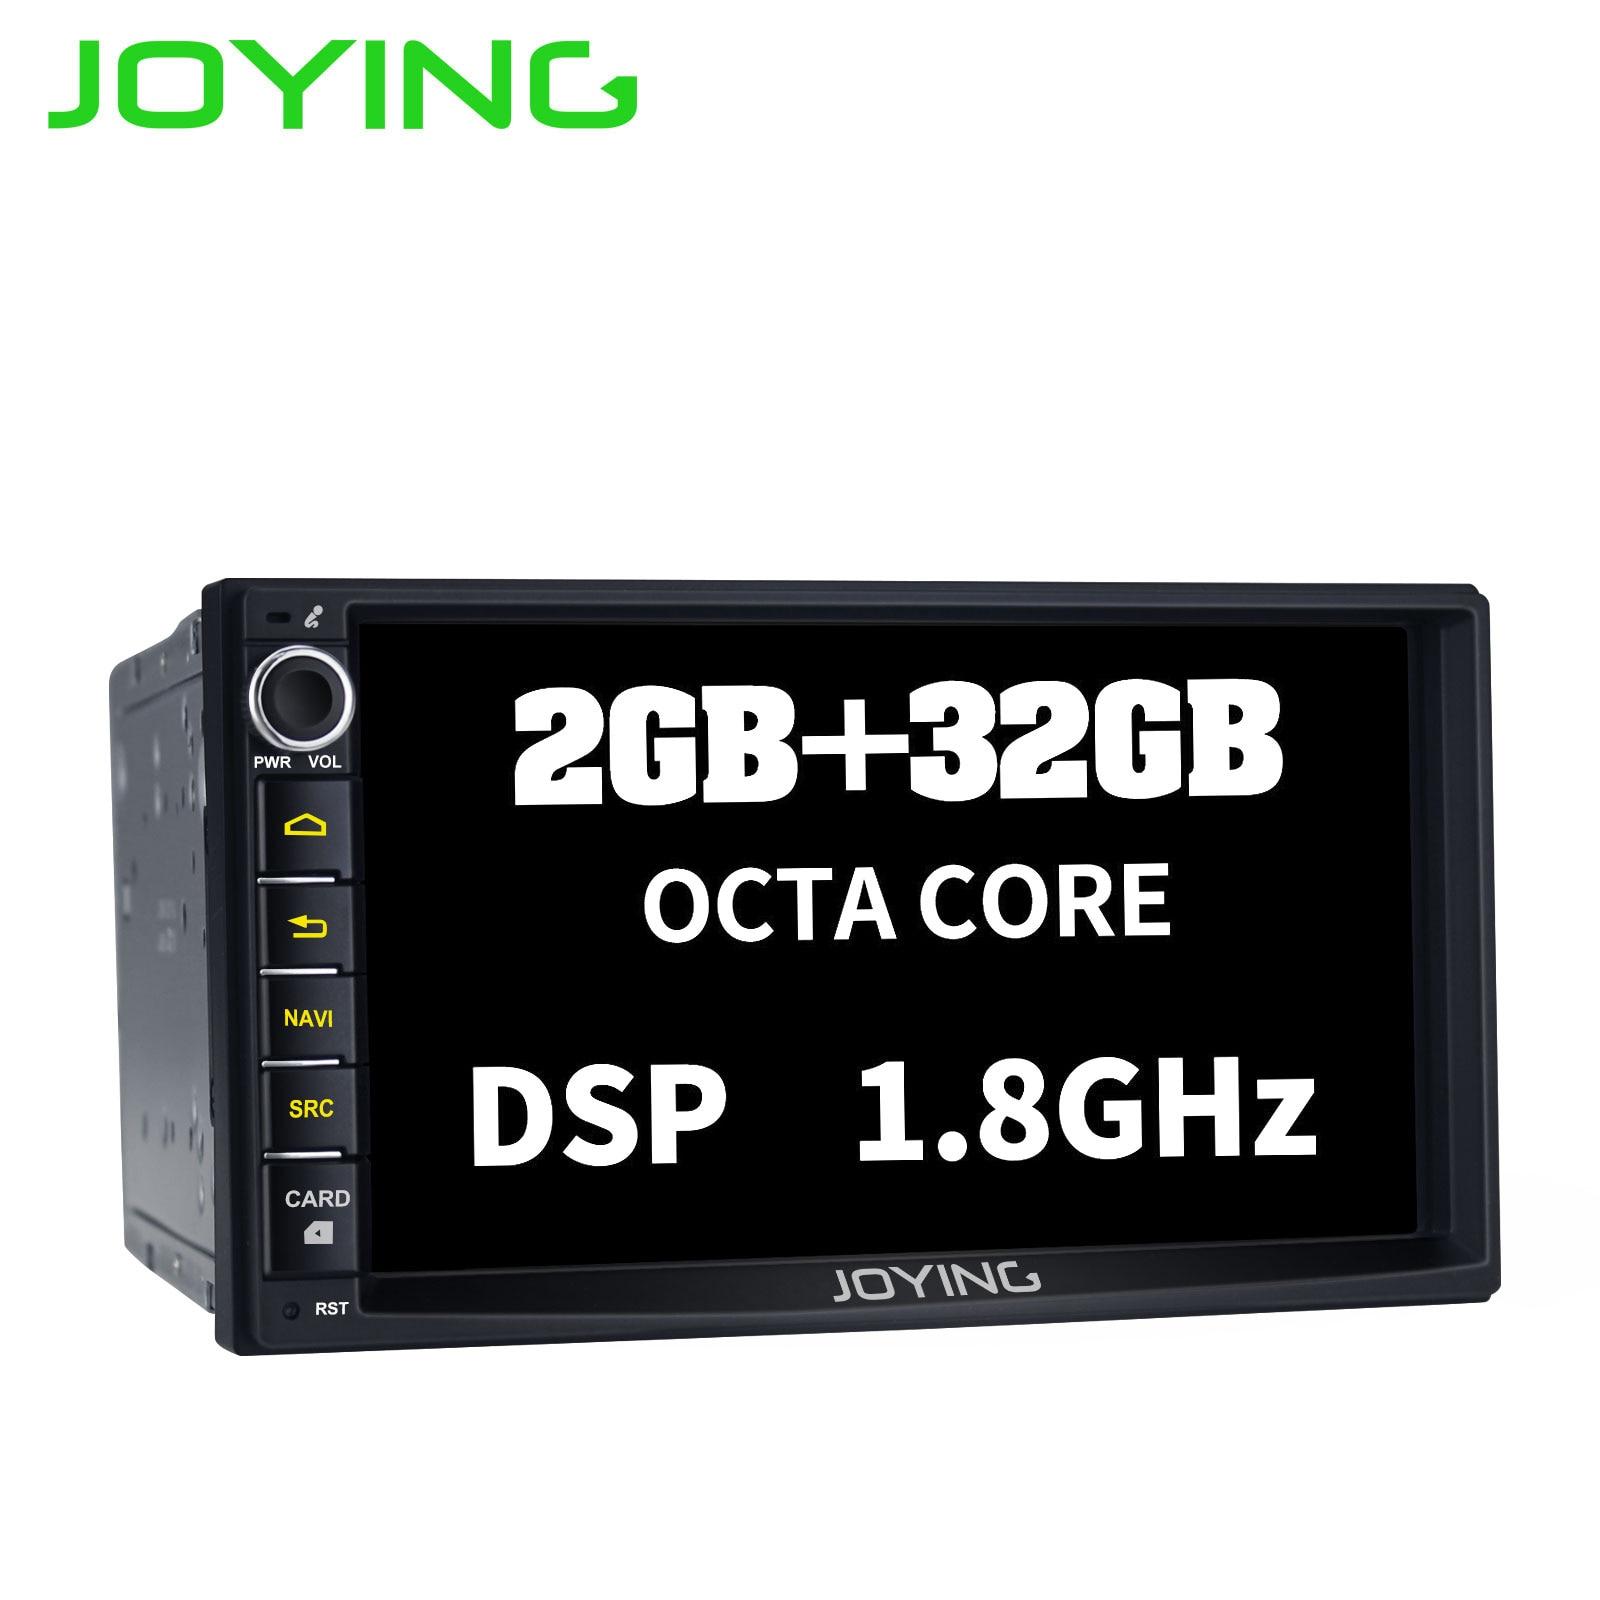 JOYING 7 2GB 32GB Octa 8 Core Android 8 1 head unit 2 din car radio